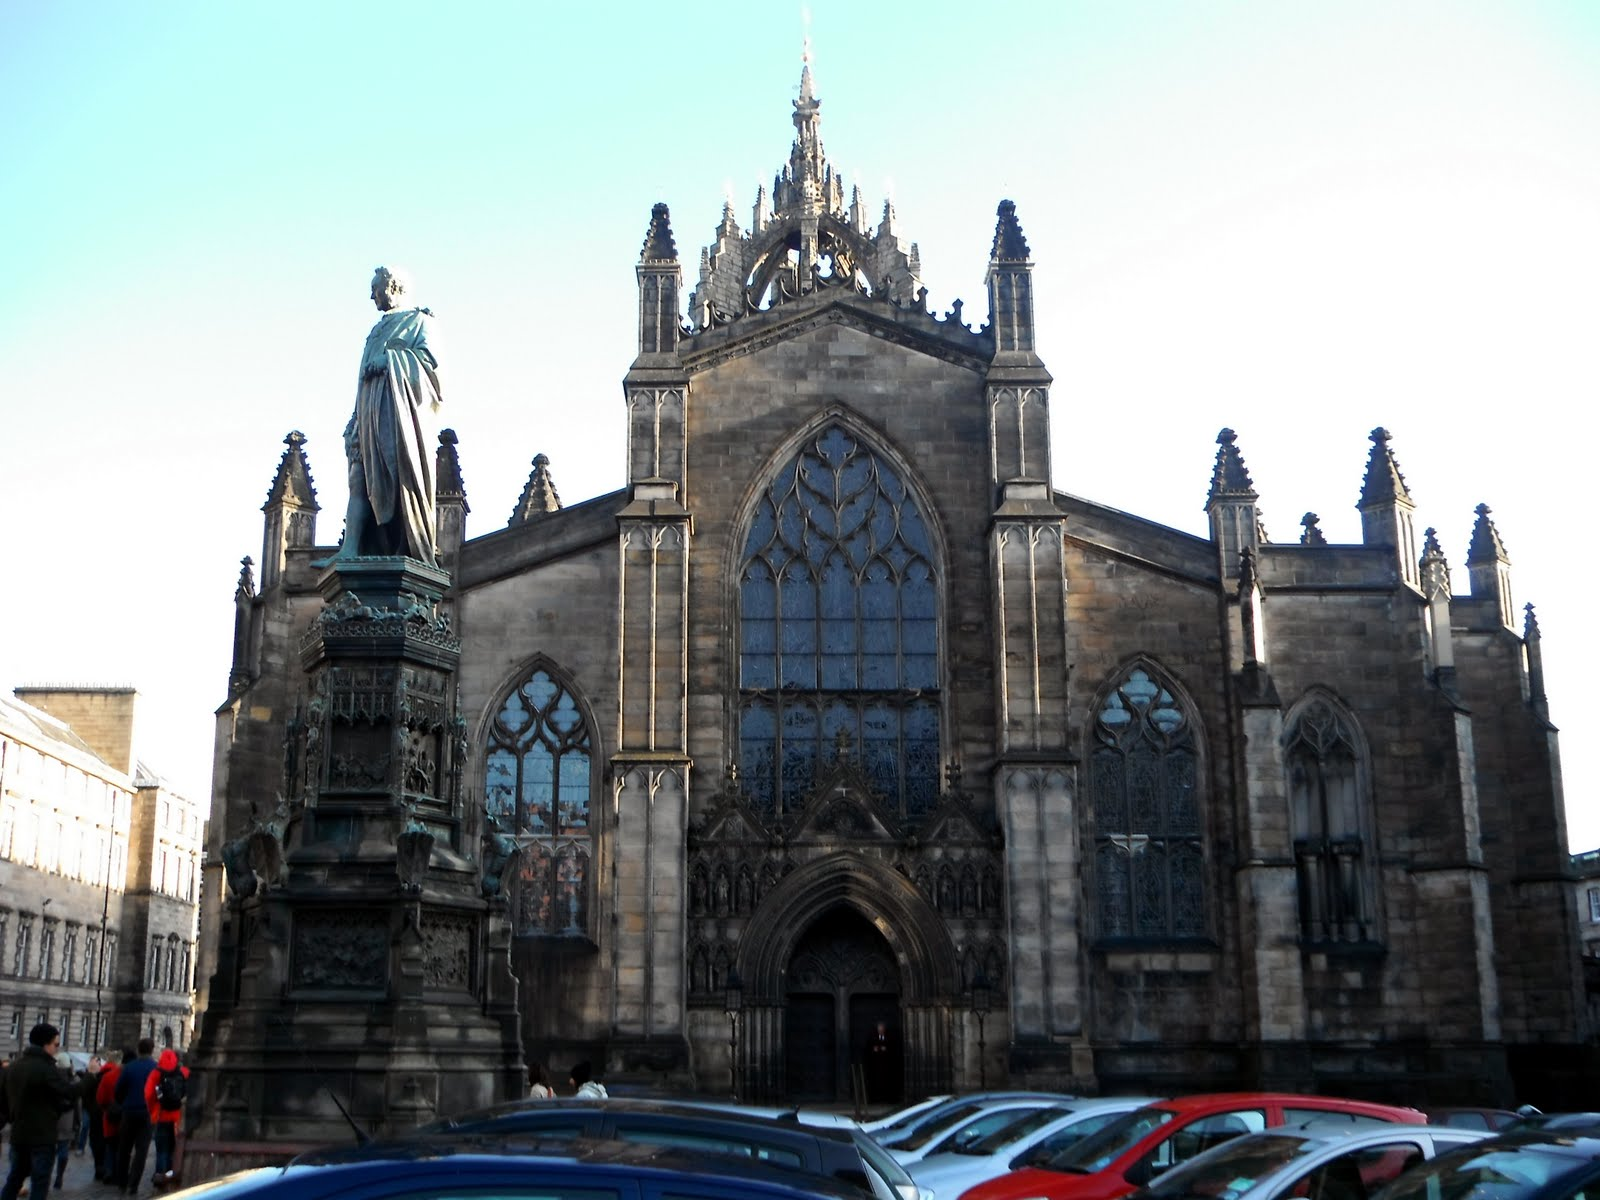 Edimburgo o londres qu ciudad es m s bonita vero4travel for Mas edimburgo